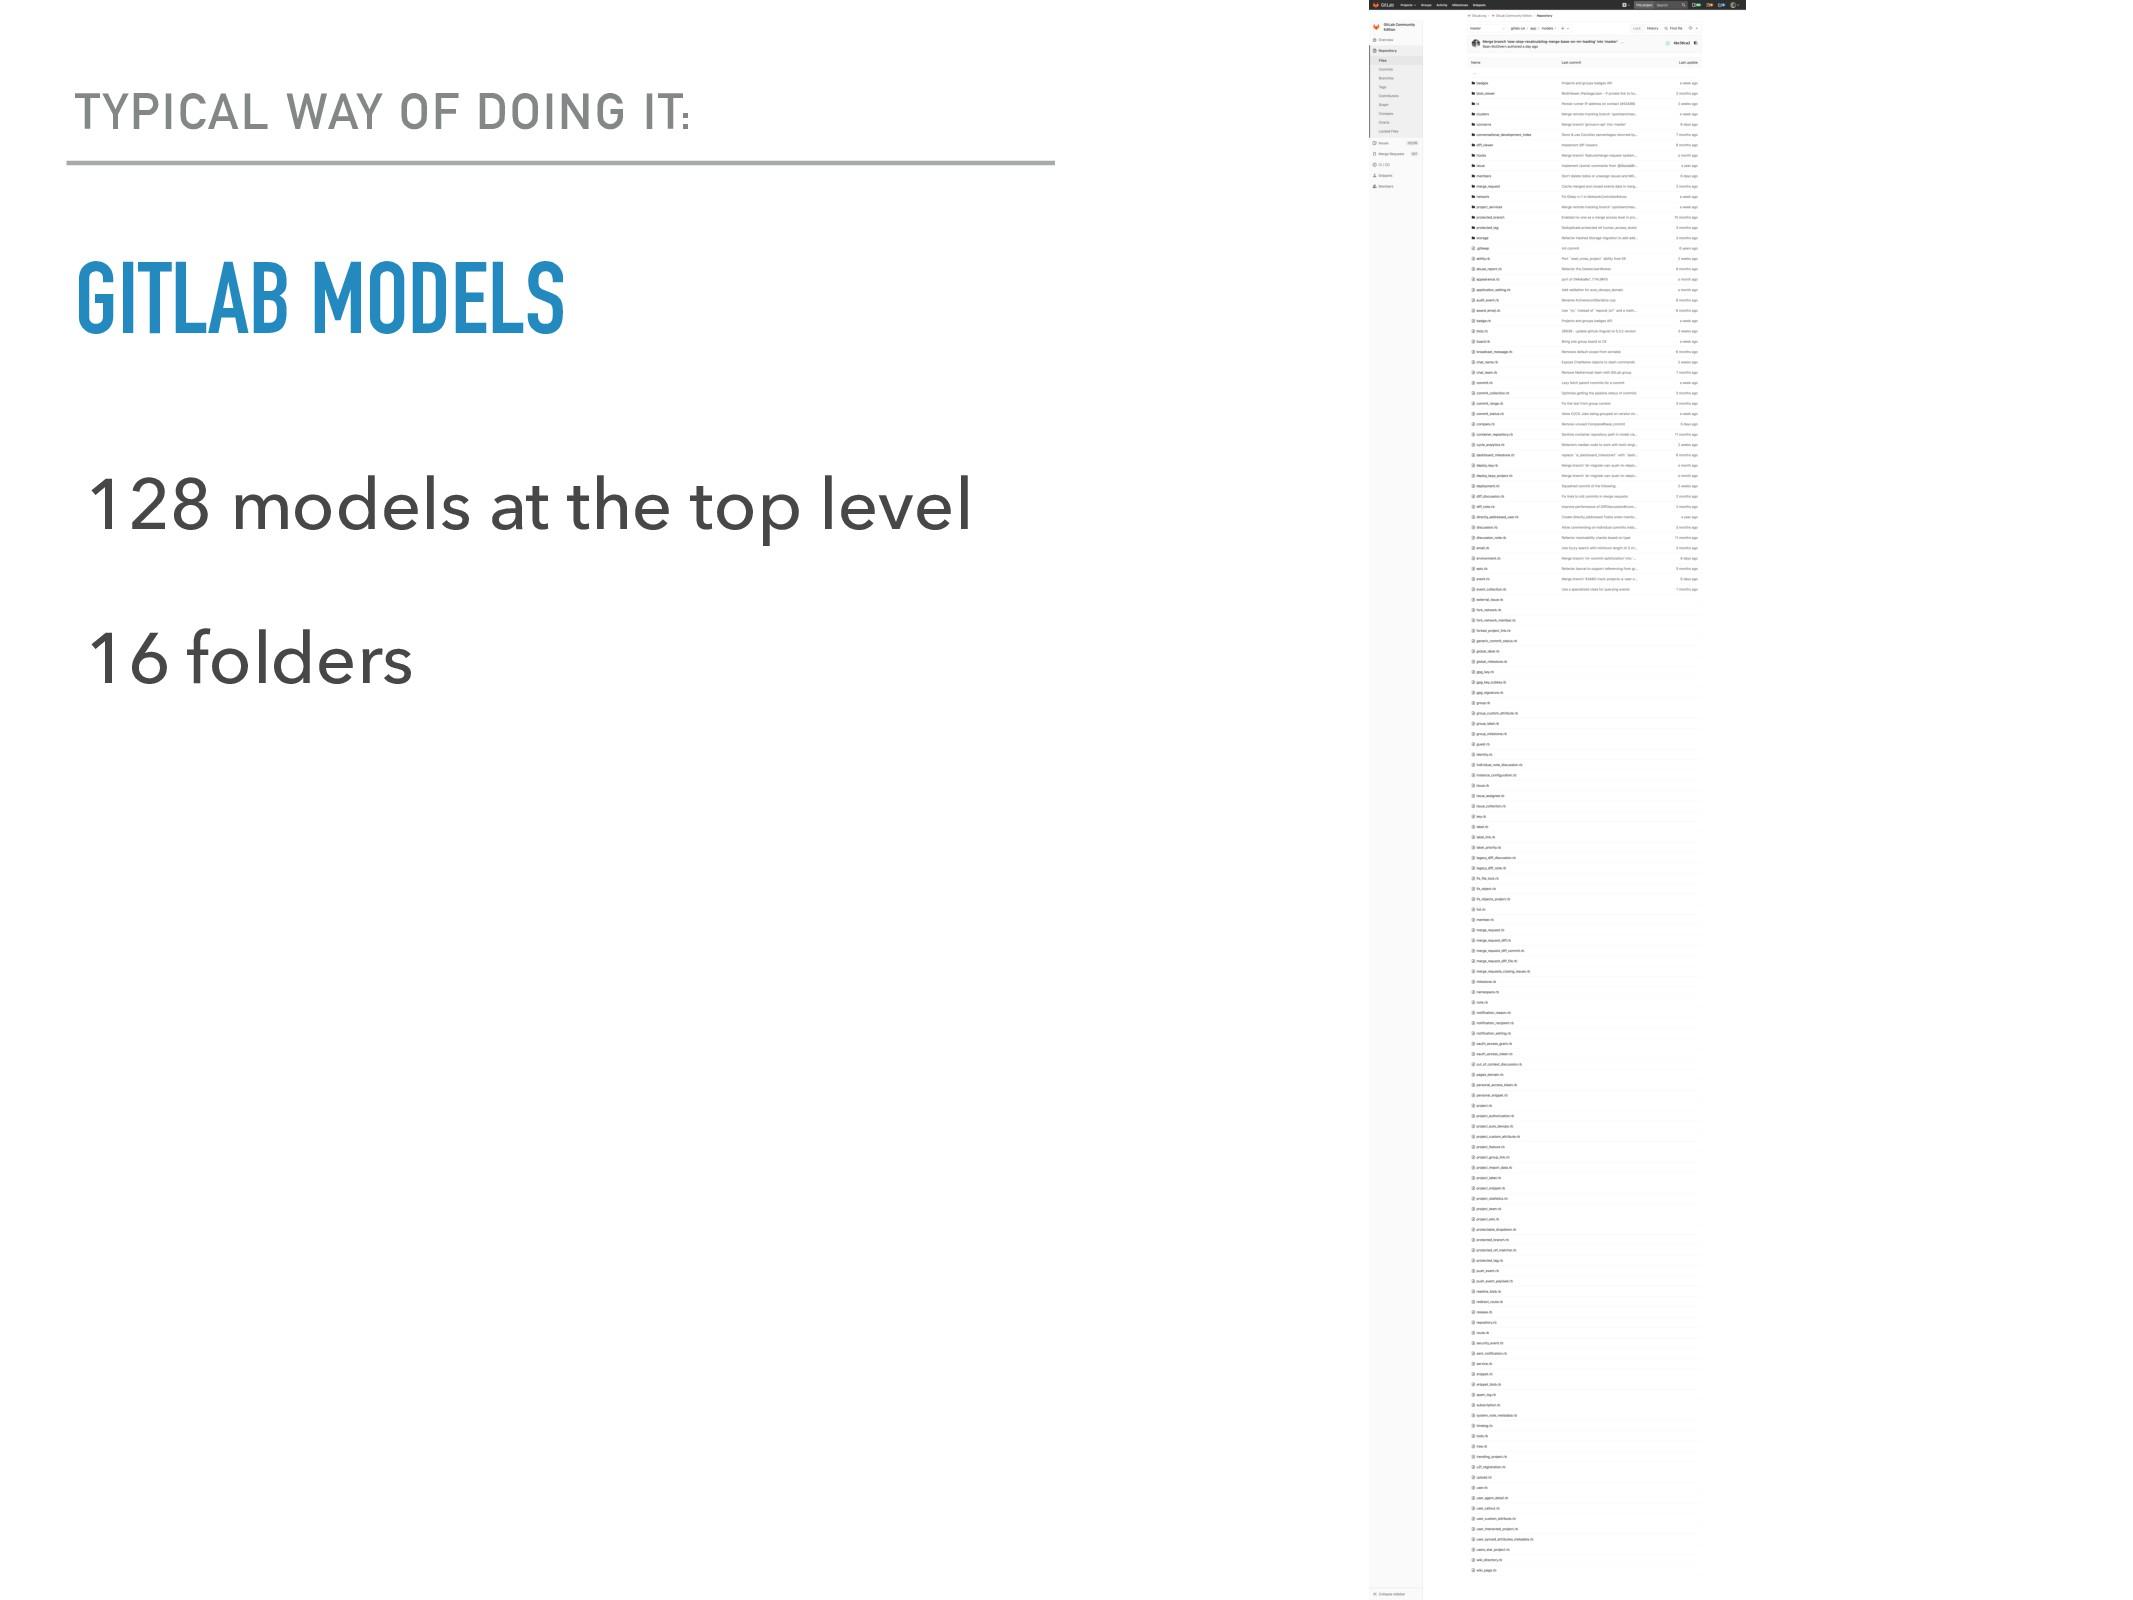 GITLAB MODELS 128 models at the top level 16 fo...